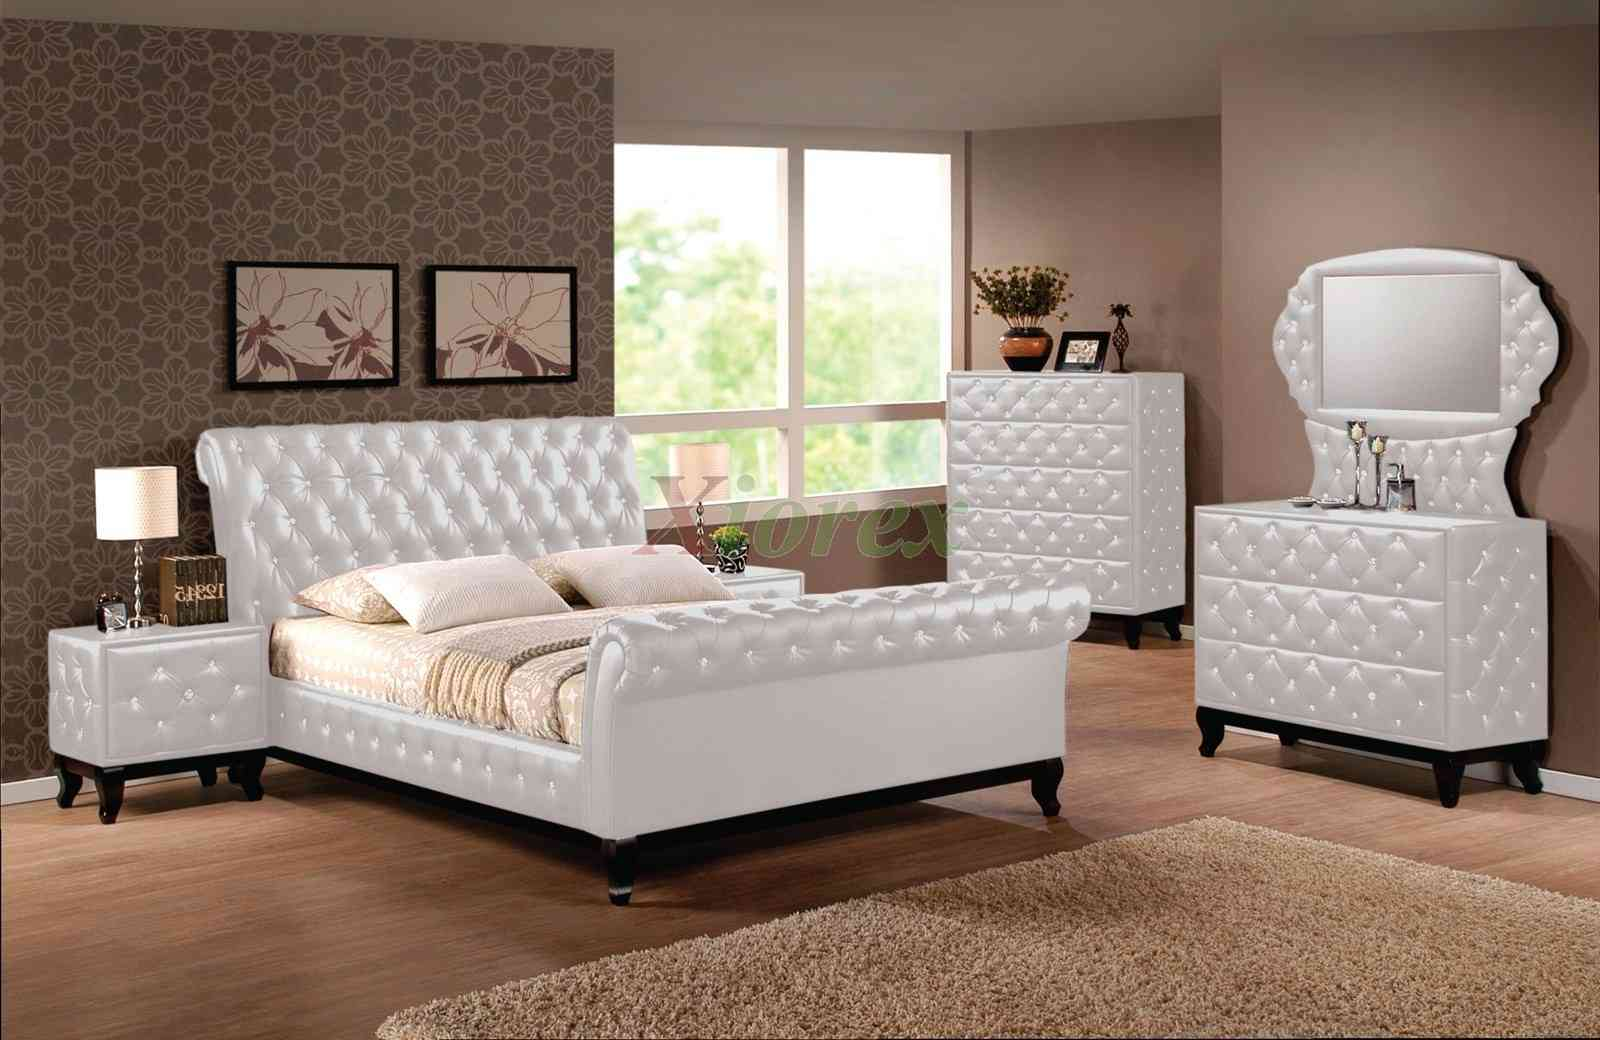 affordable bedroom furniture for girls photo - 3